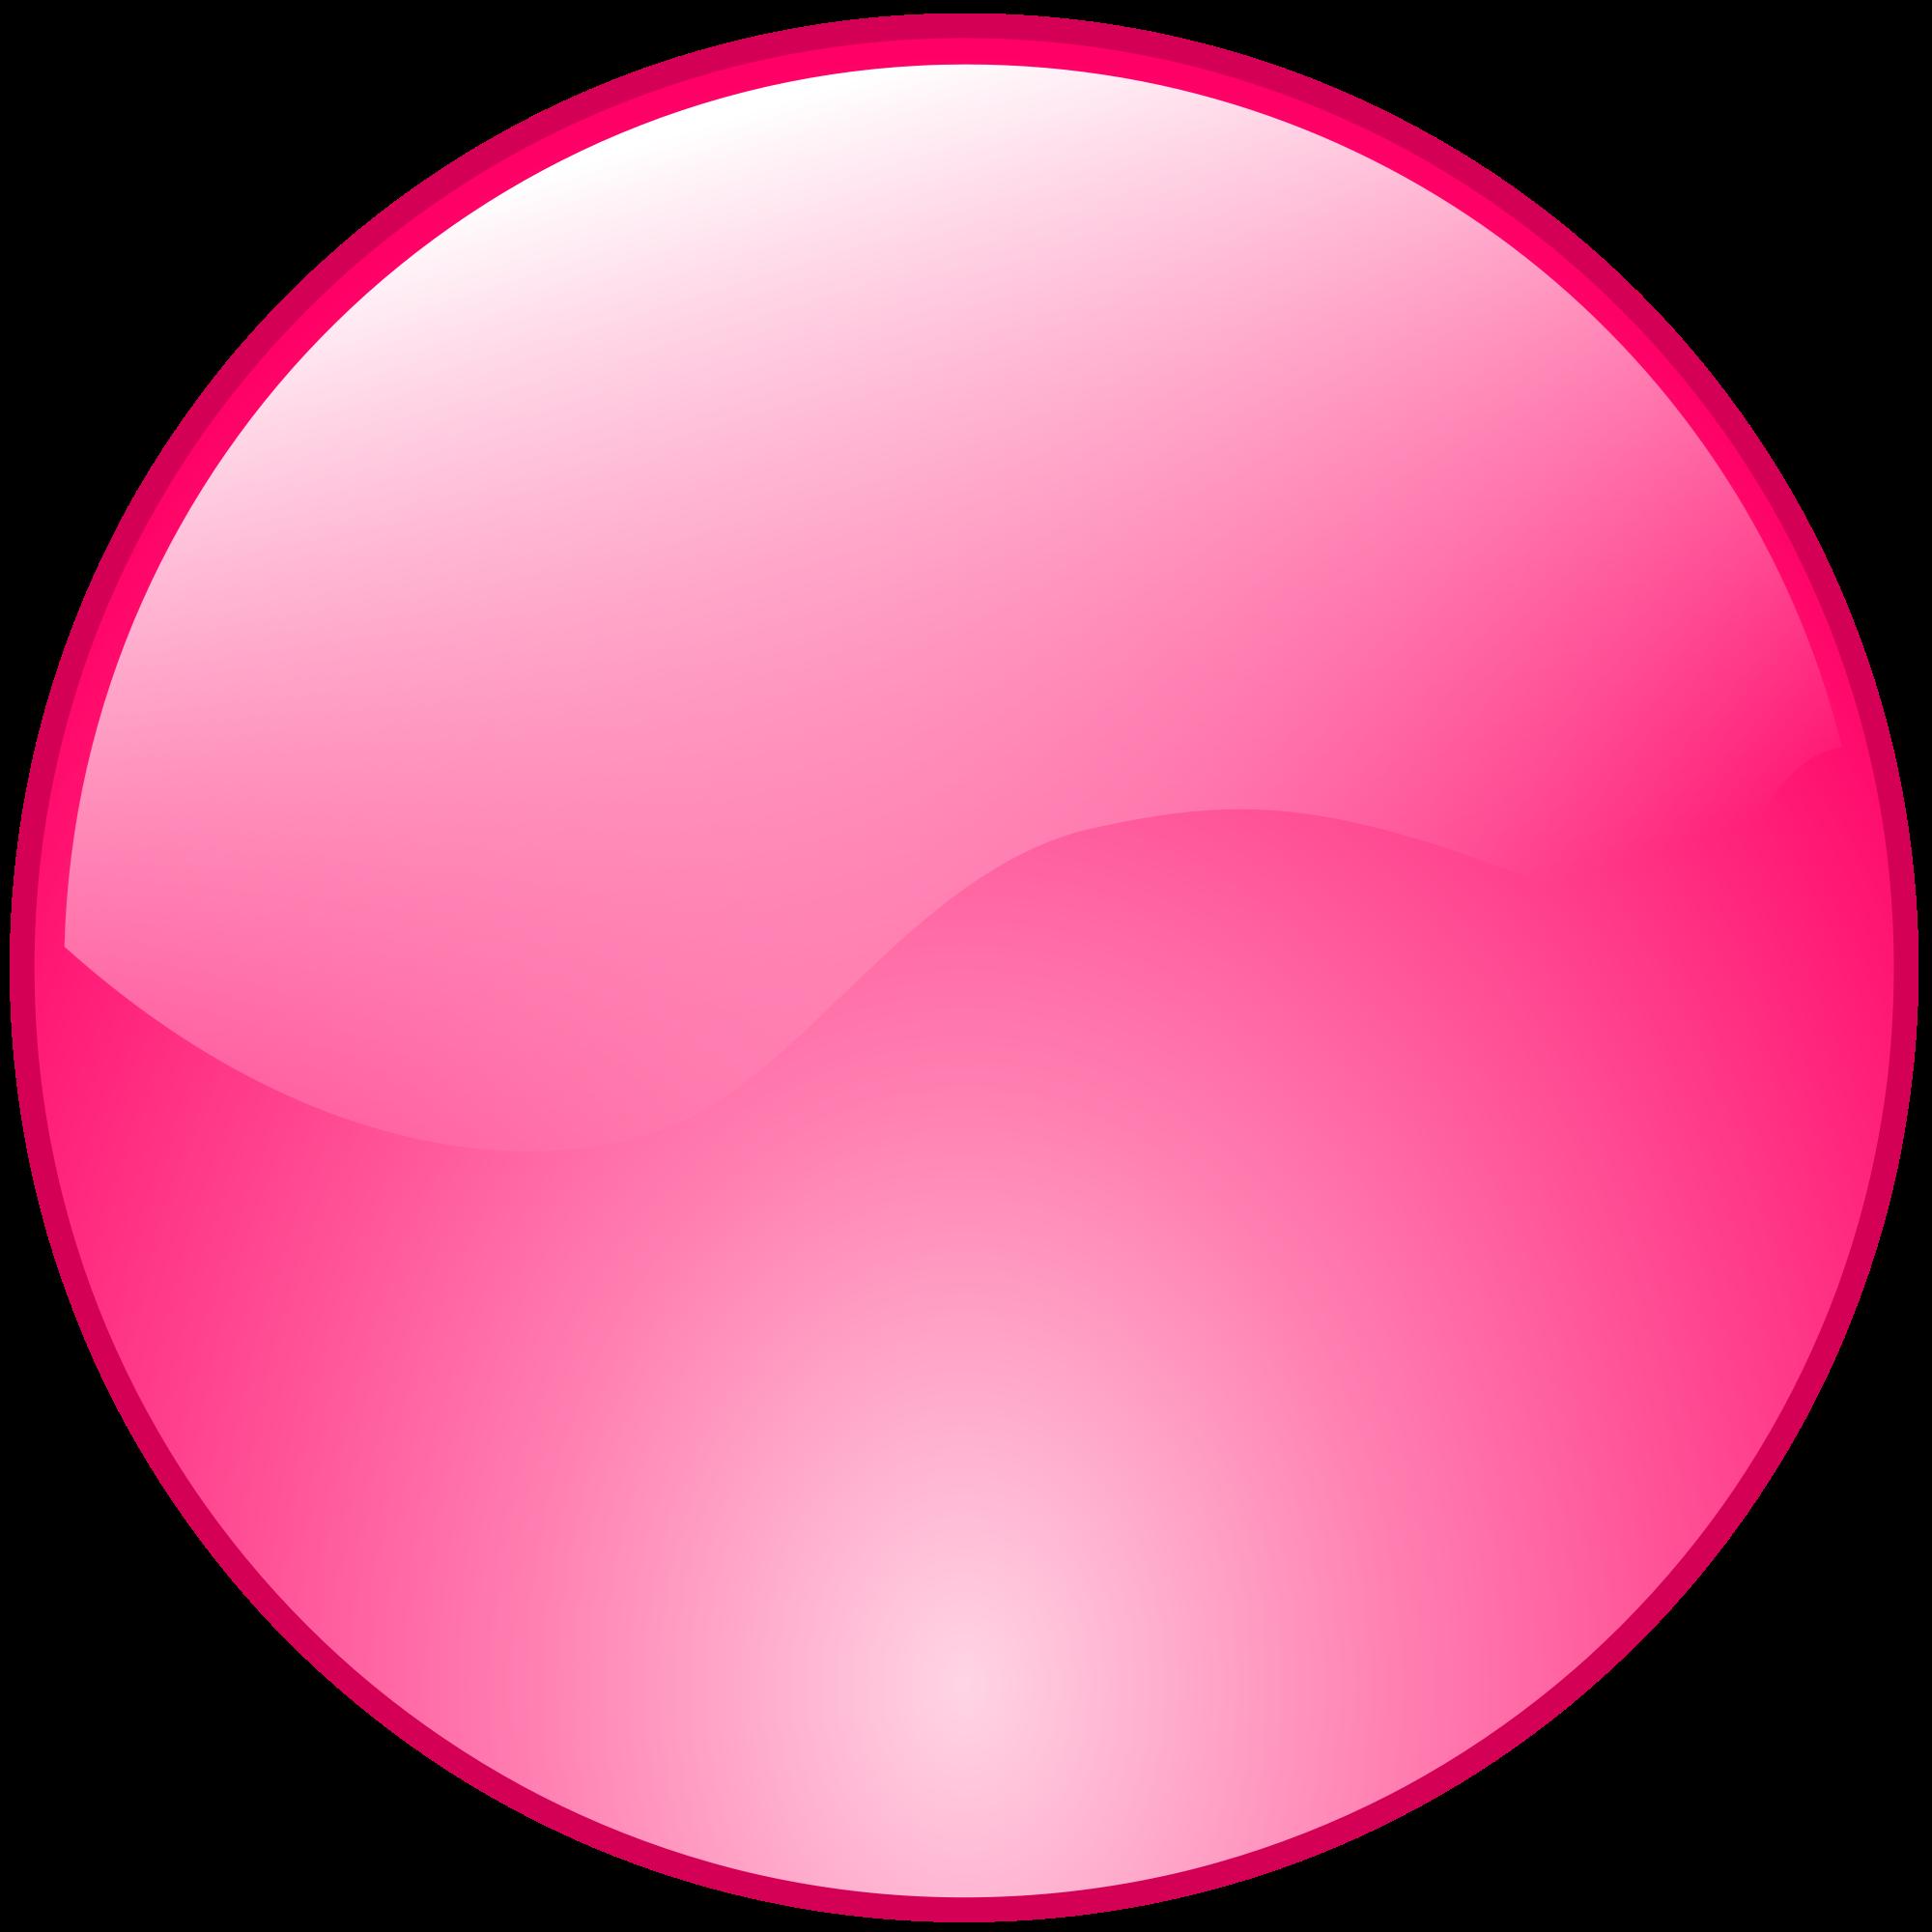 Pink svg #17, Download drawings